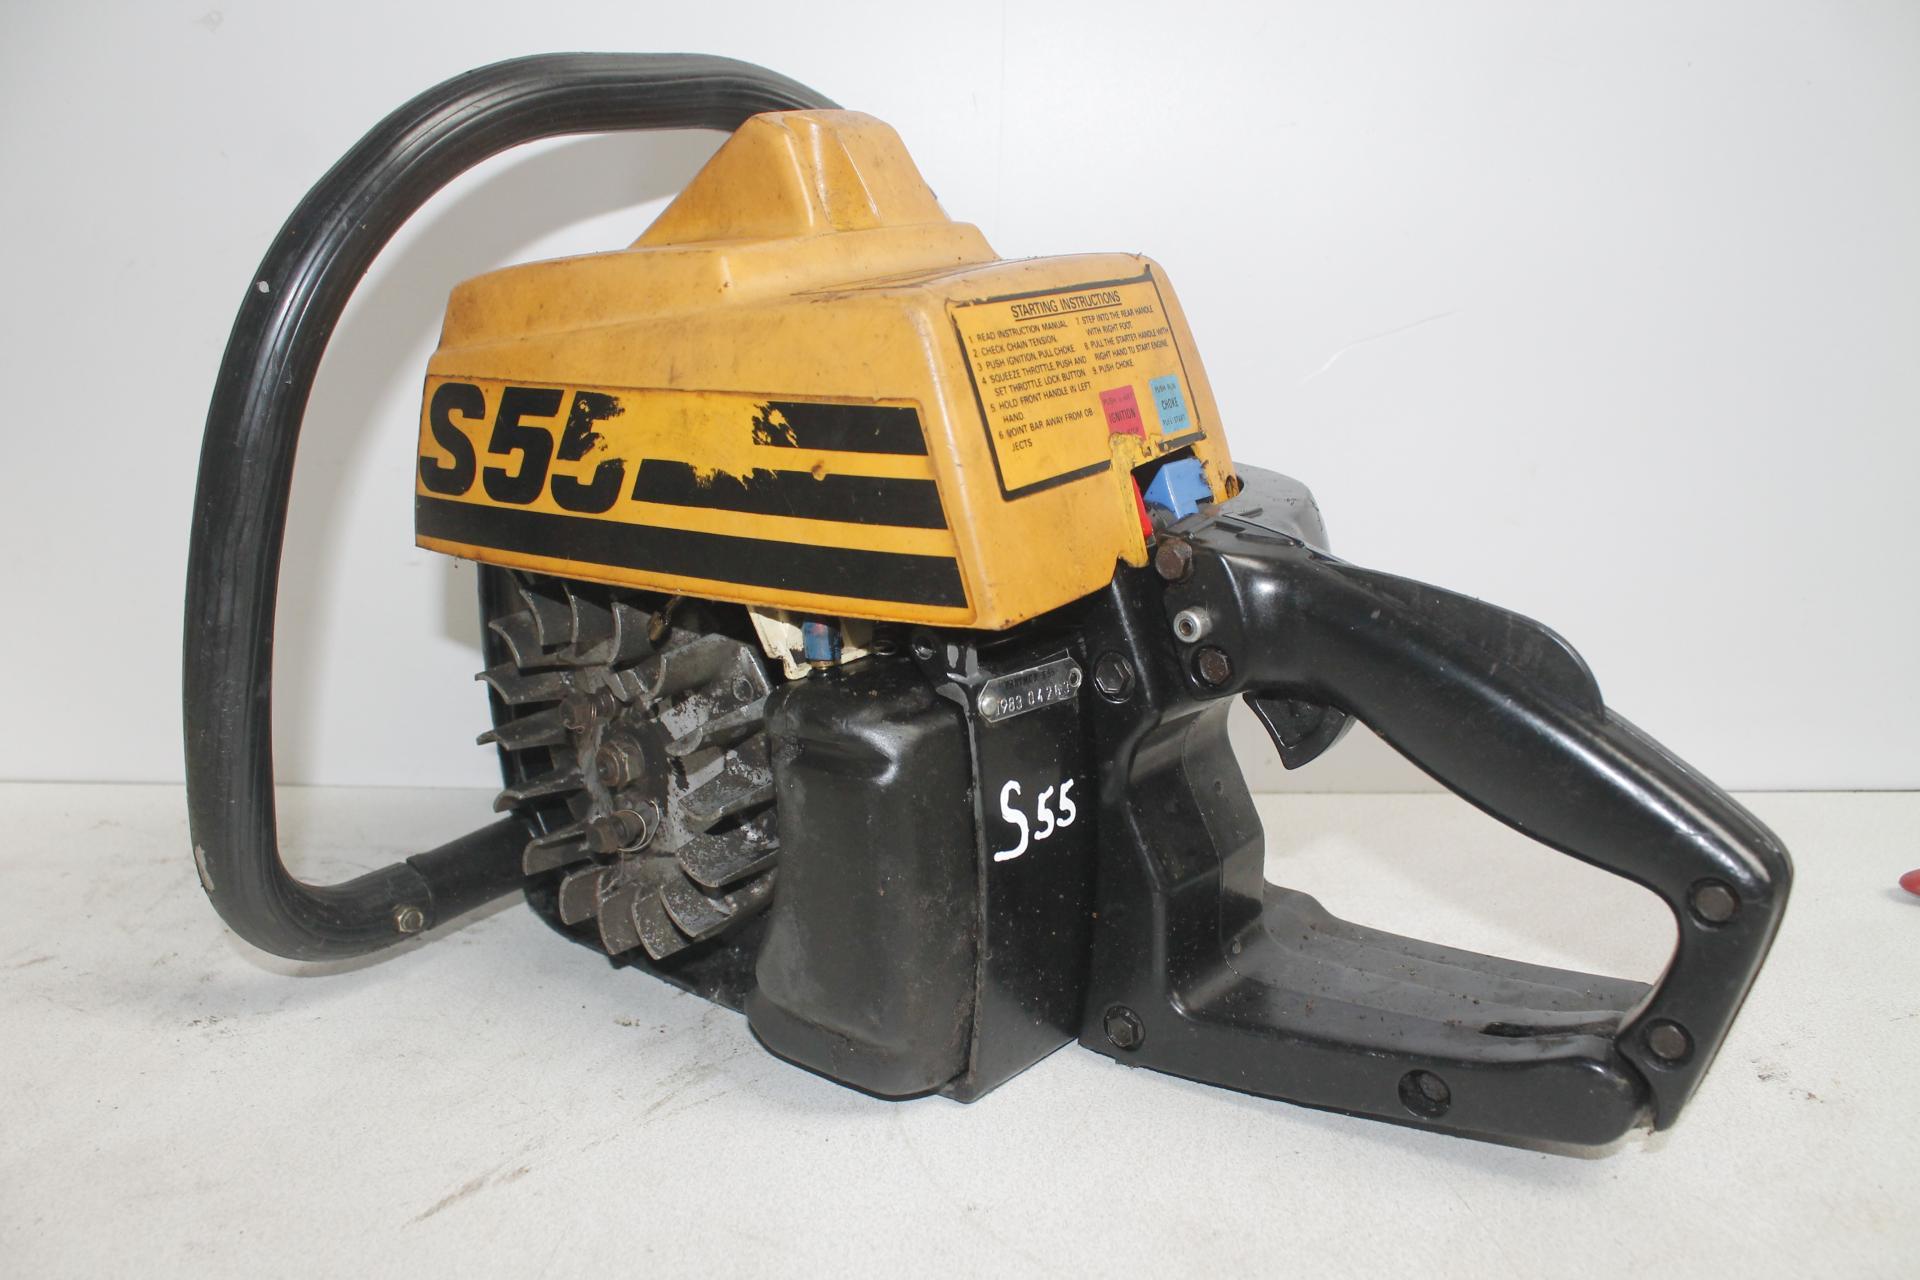 Despiece Partner s55